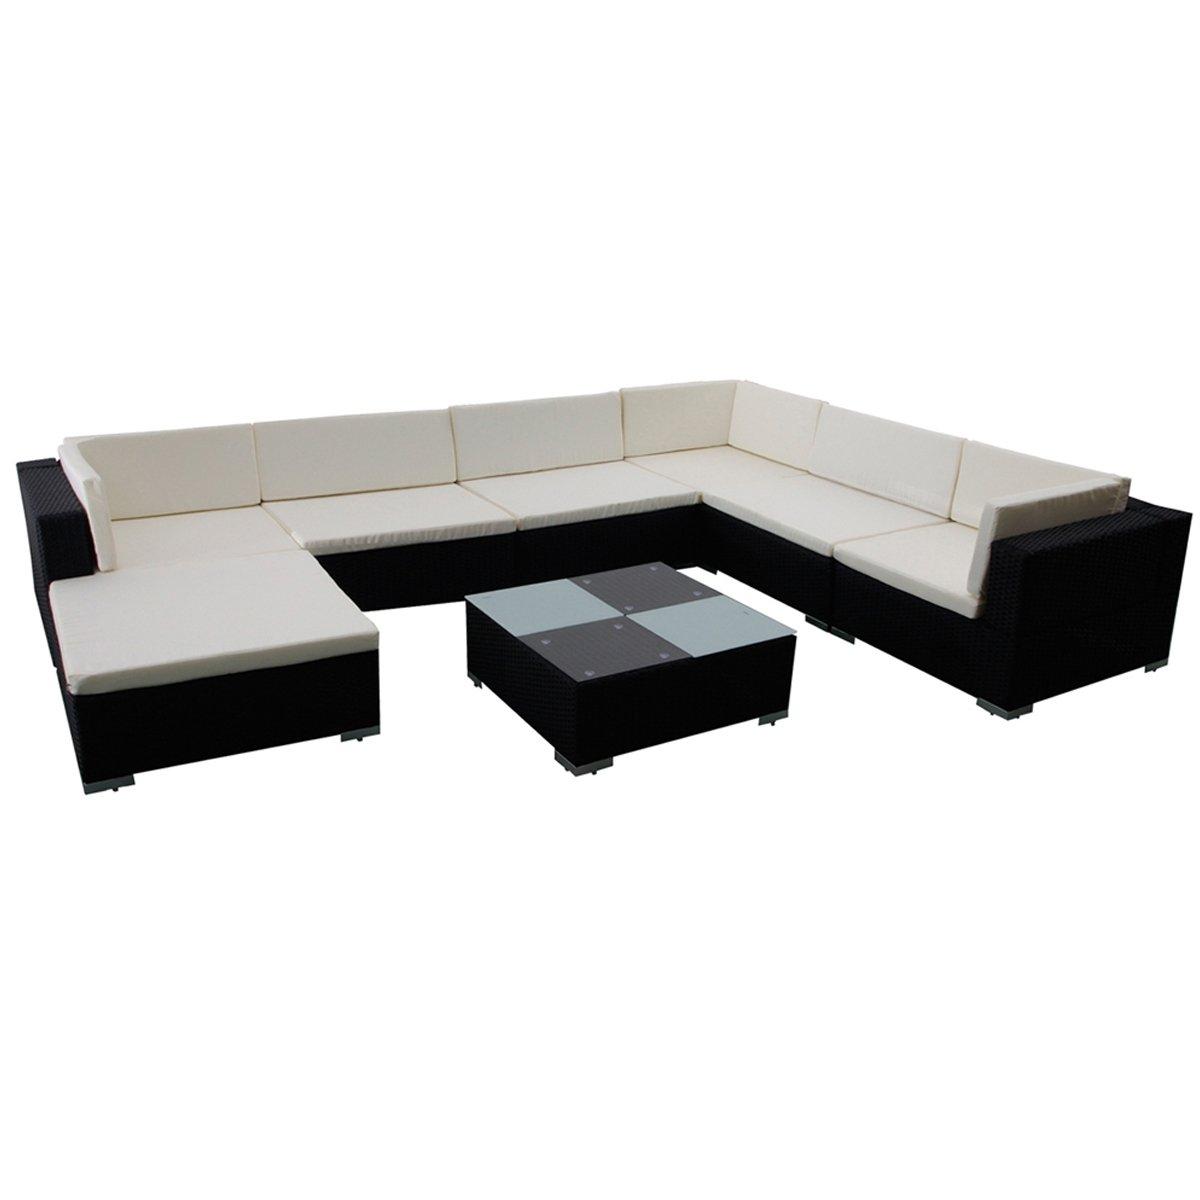 vidaXL Gartenmöbel Poly Rattan Set Lounge Schwarz 24-teilig